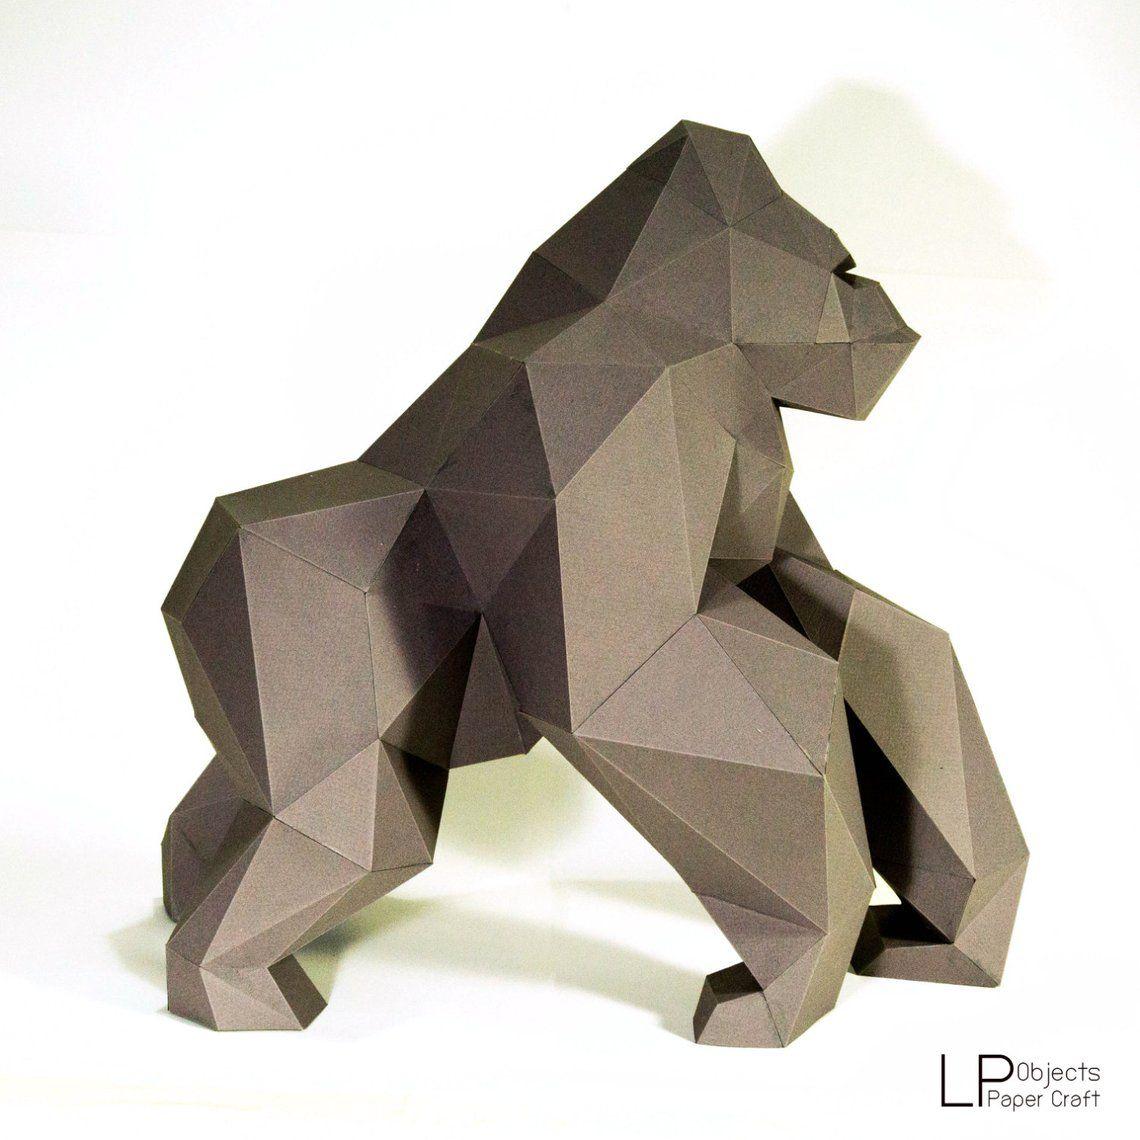 Gorilla King Kong Paper Craft Digital Template Origami Pdf Etsy In 2020 Paper Crafts Paper Sculpture King Kong